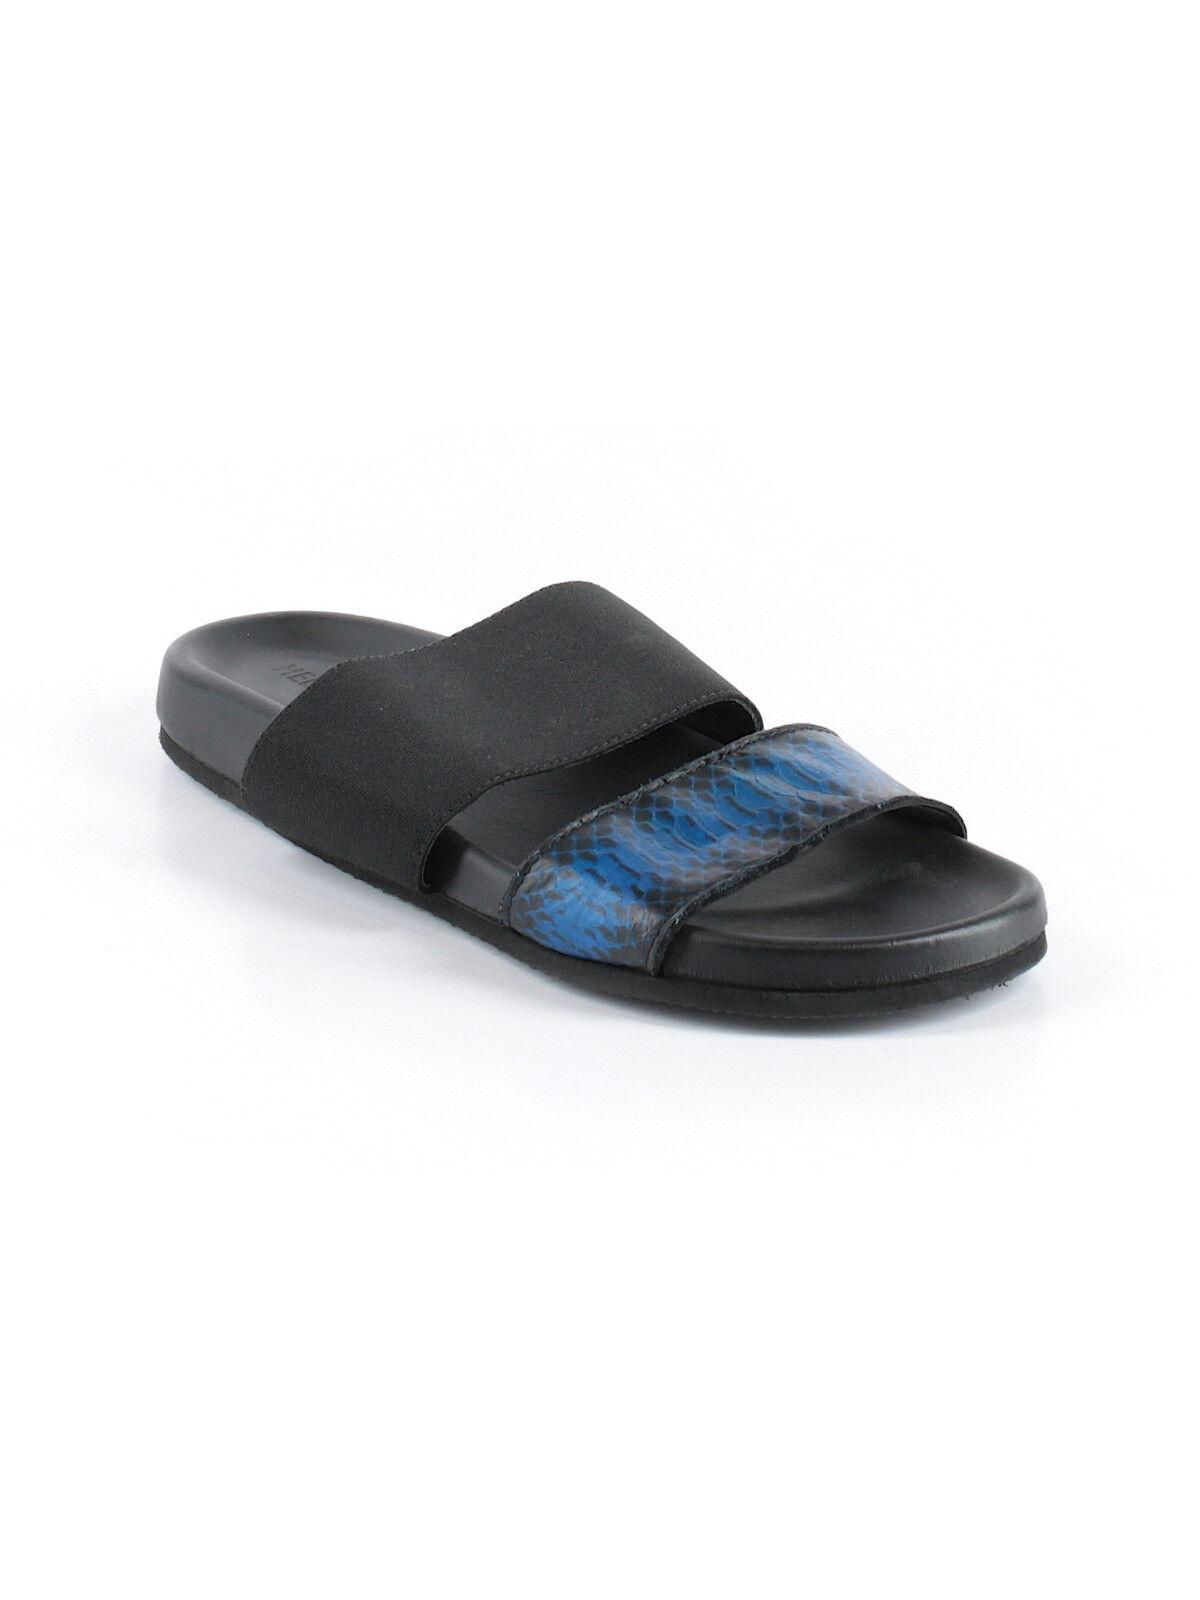 Helmut Lang Negro Azul Azul Azul Sandalias De Piel De Serpiente Talla 6.5 (US) 36.5 (EU)  muy popular